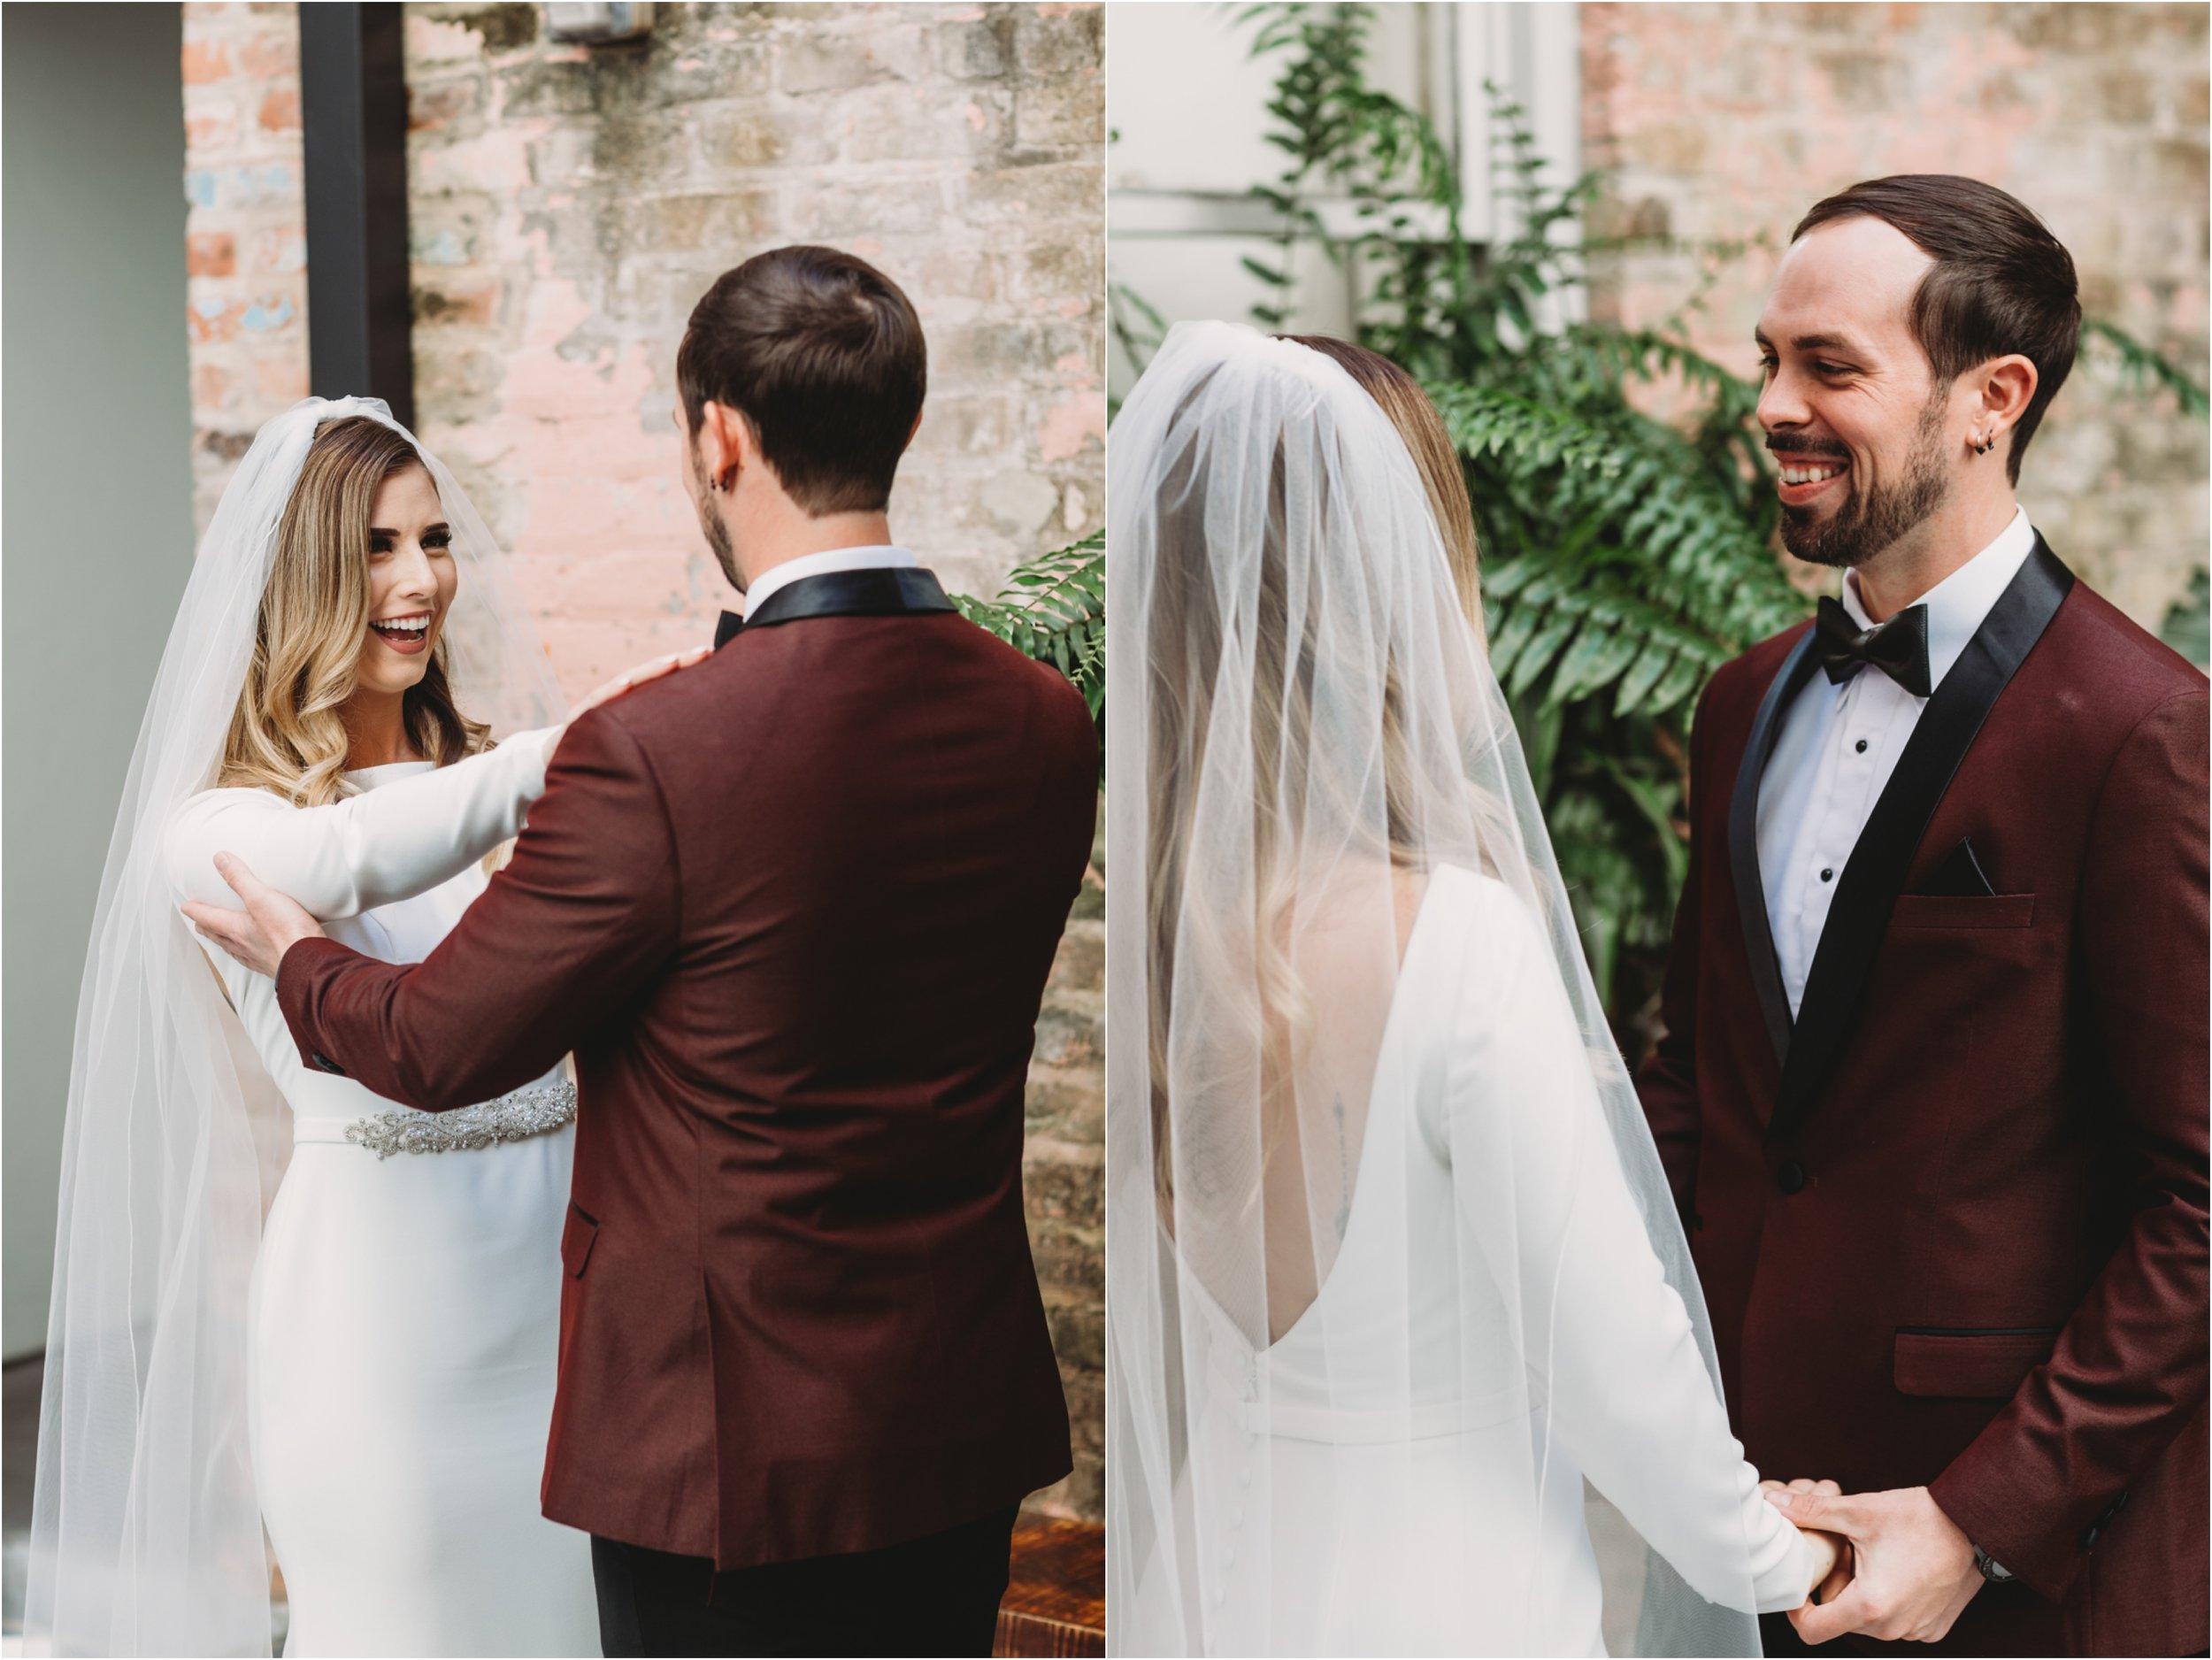 Wedding at Catahoula Hotel New Orleans Wedding Photographer16.jpg